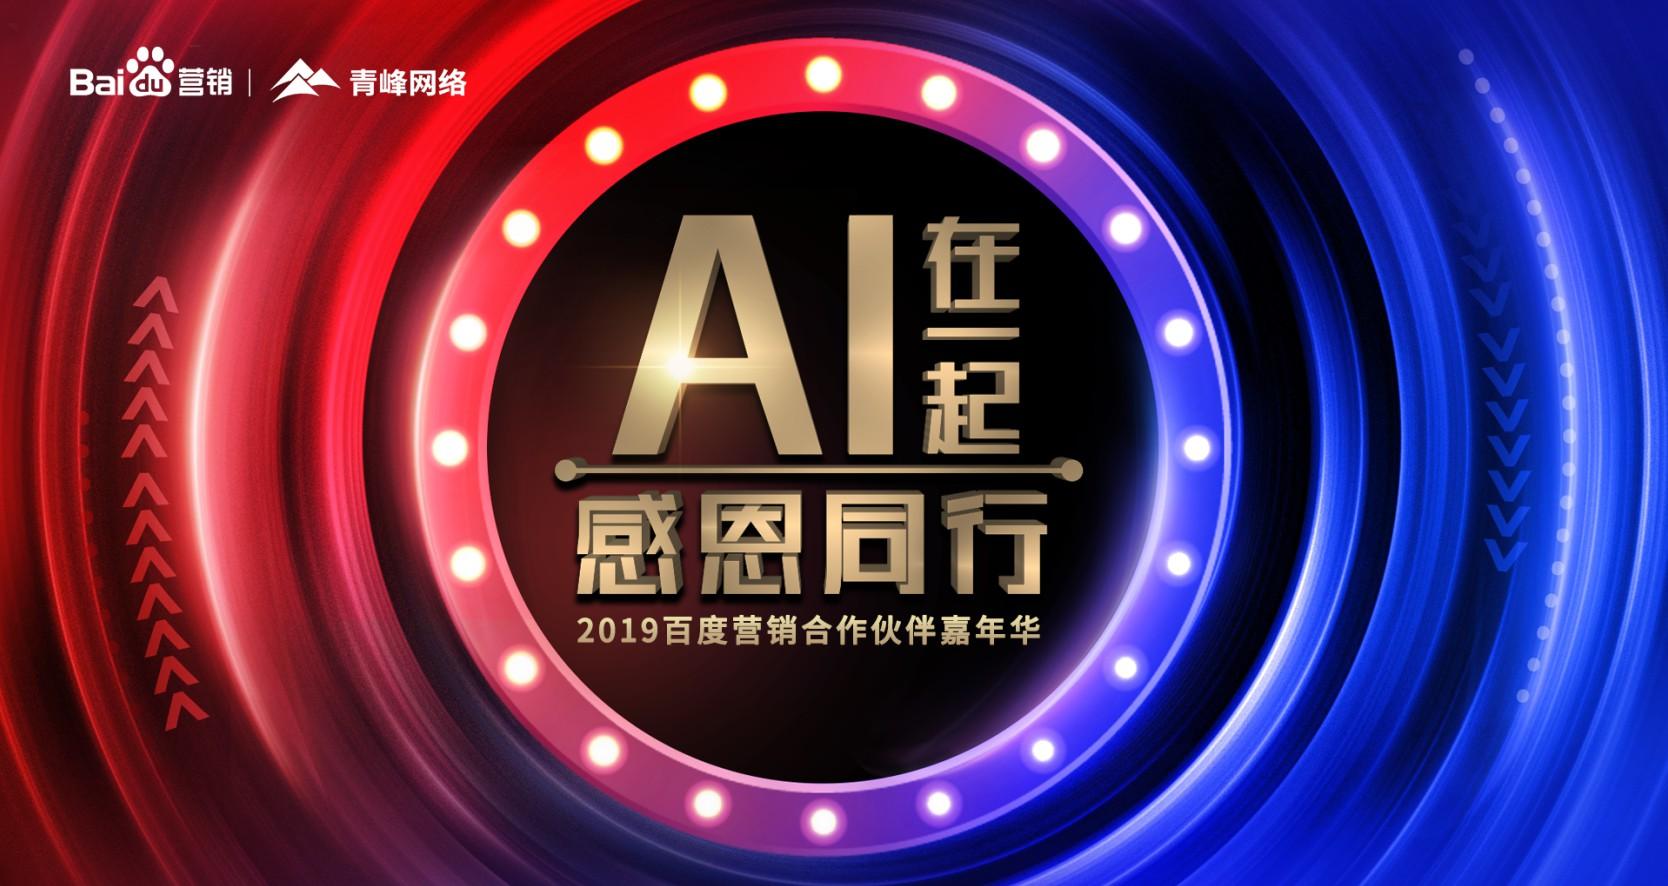 AI在一起 感恩同行丨2019百度营销合作伙伴嘉年华圆满成功!